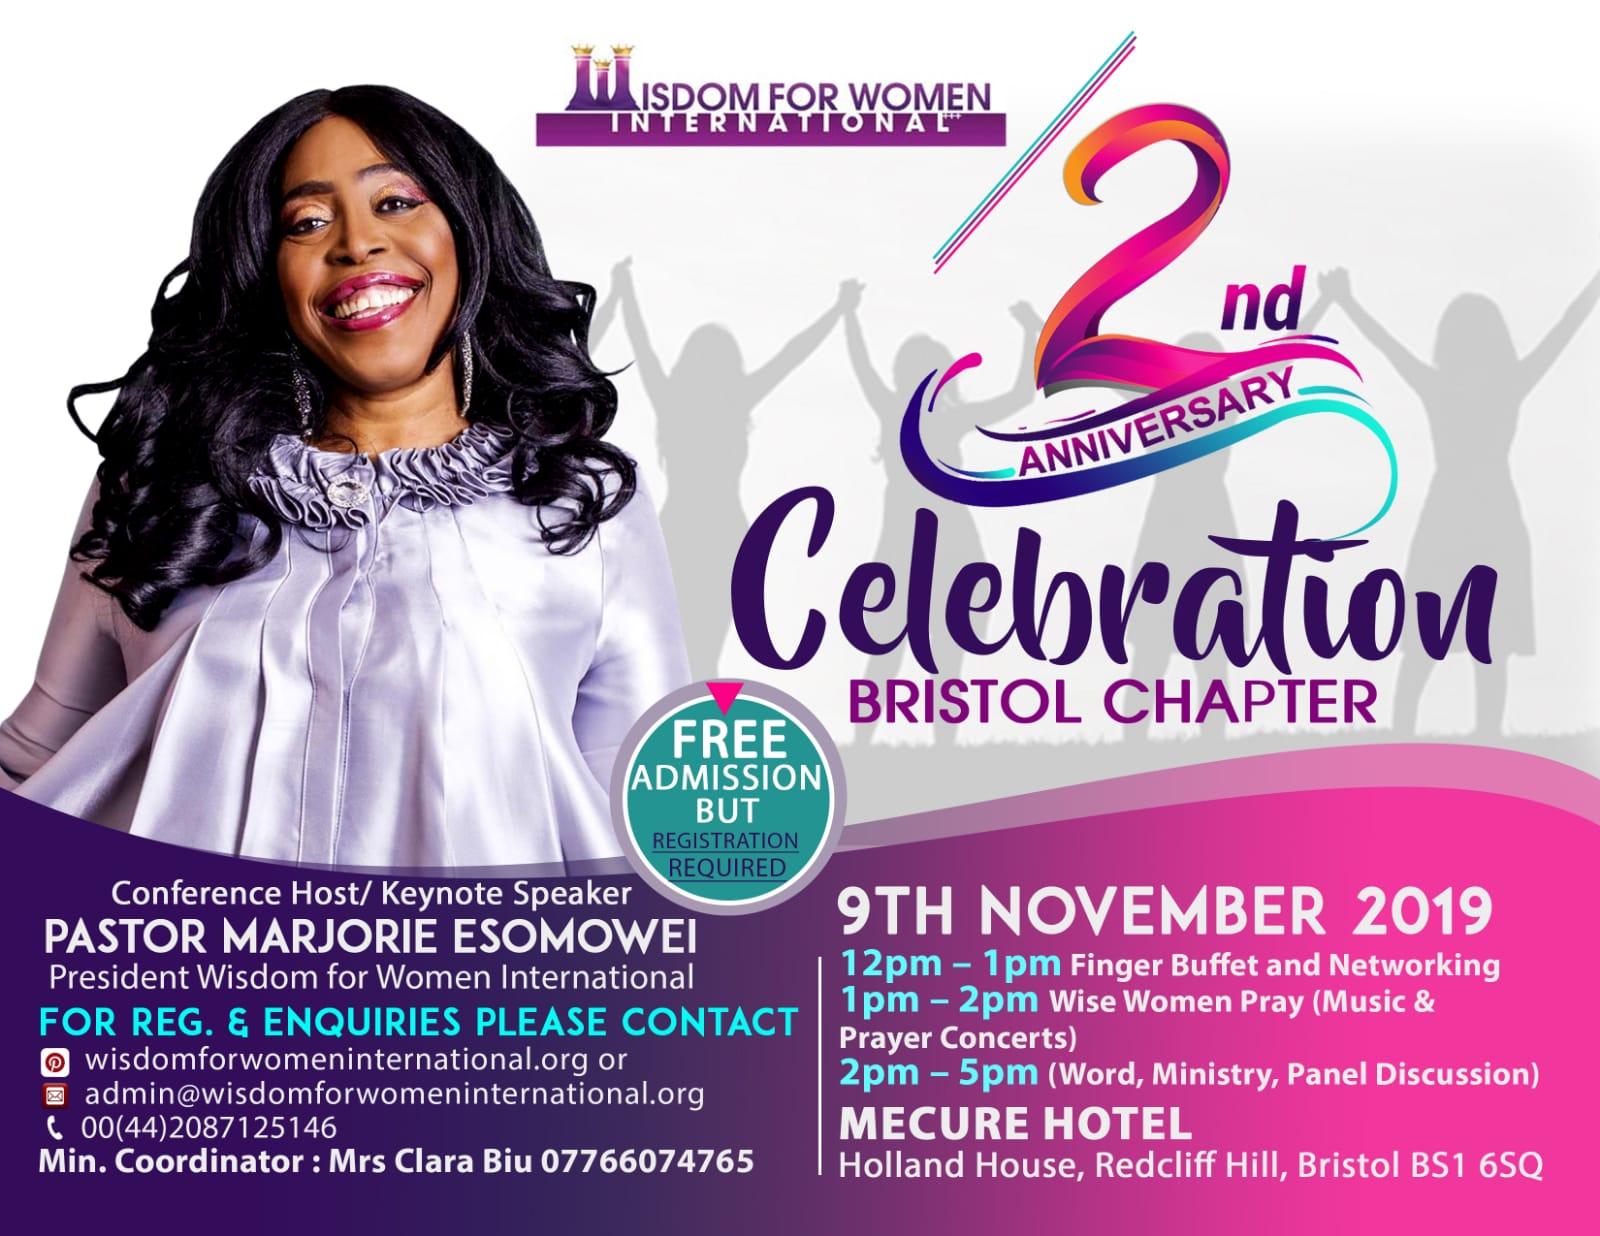 2nd Anniversary Celebration Bristol Chapter